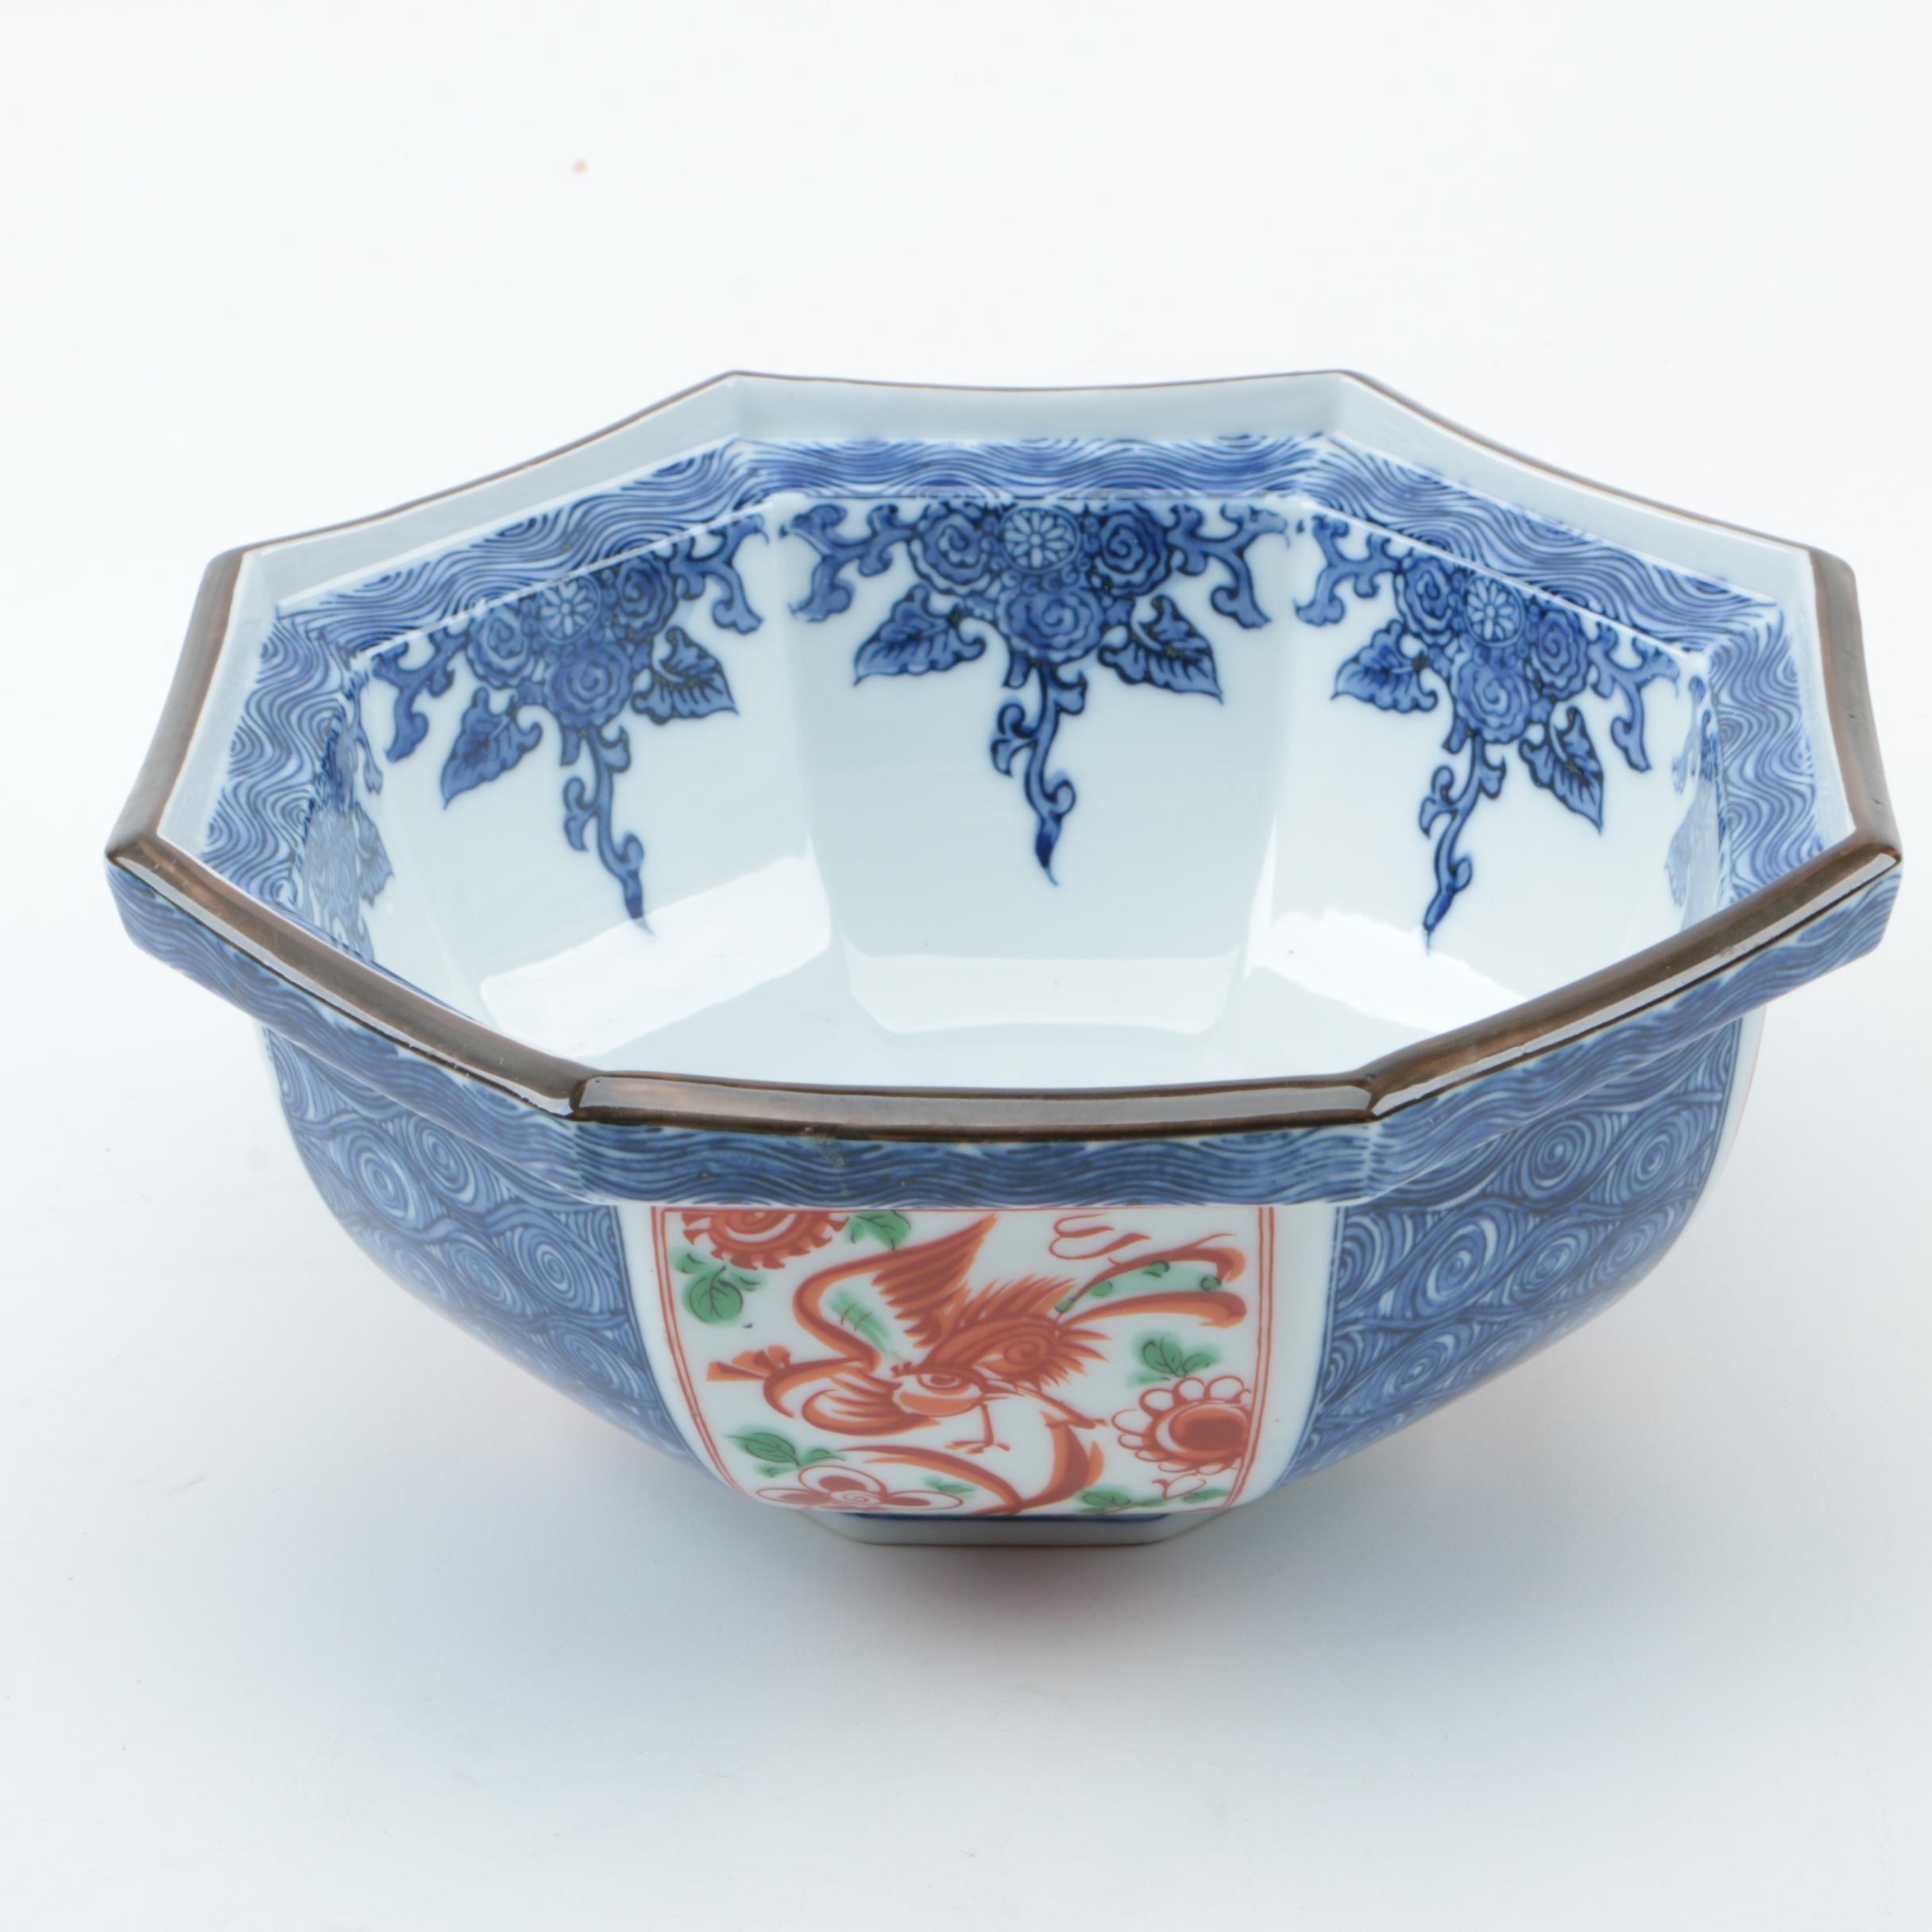 Japanese Decorative Porcelain Bowl